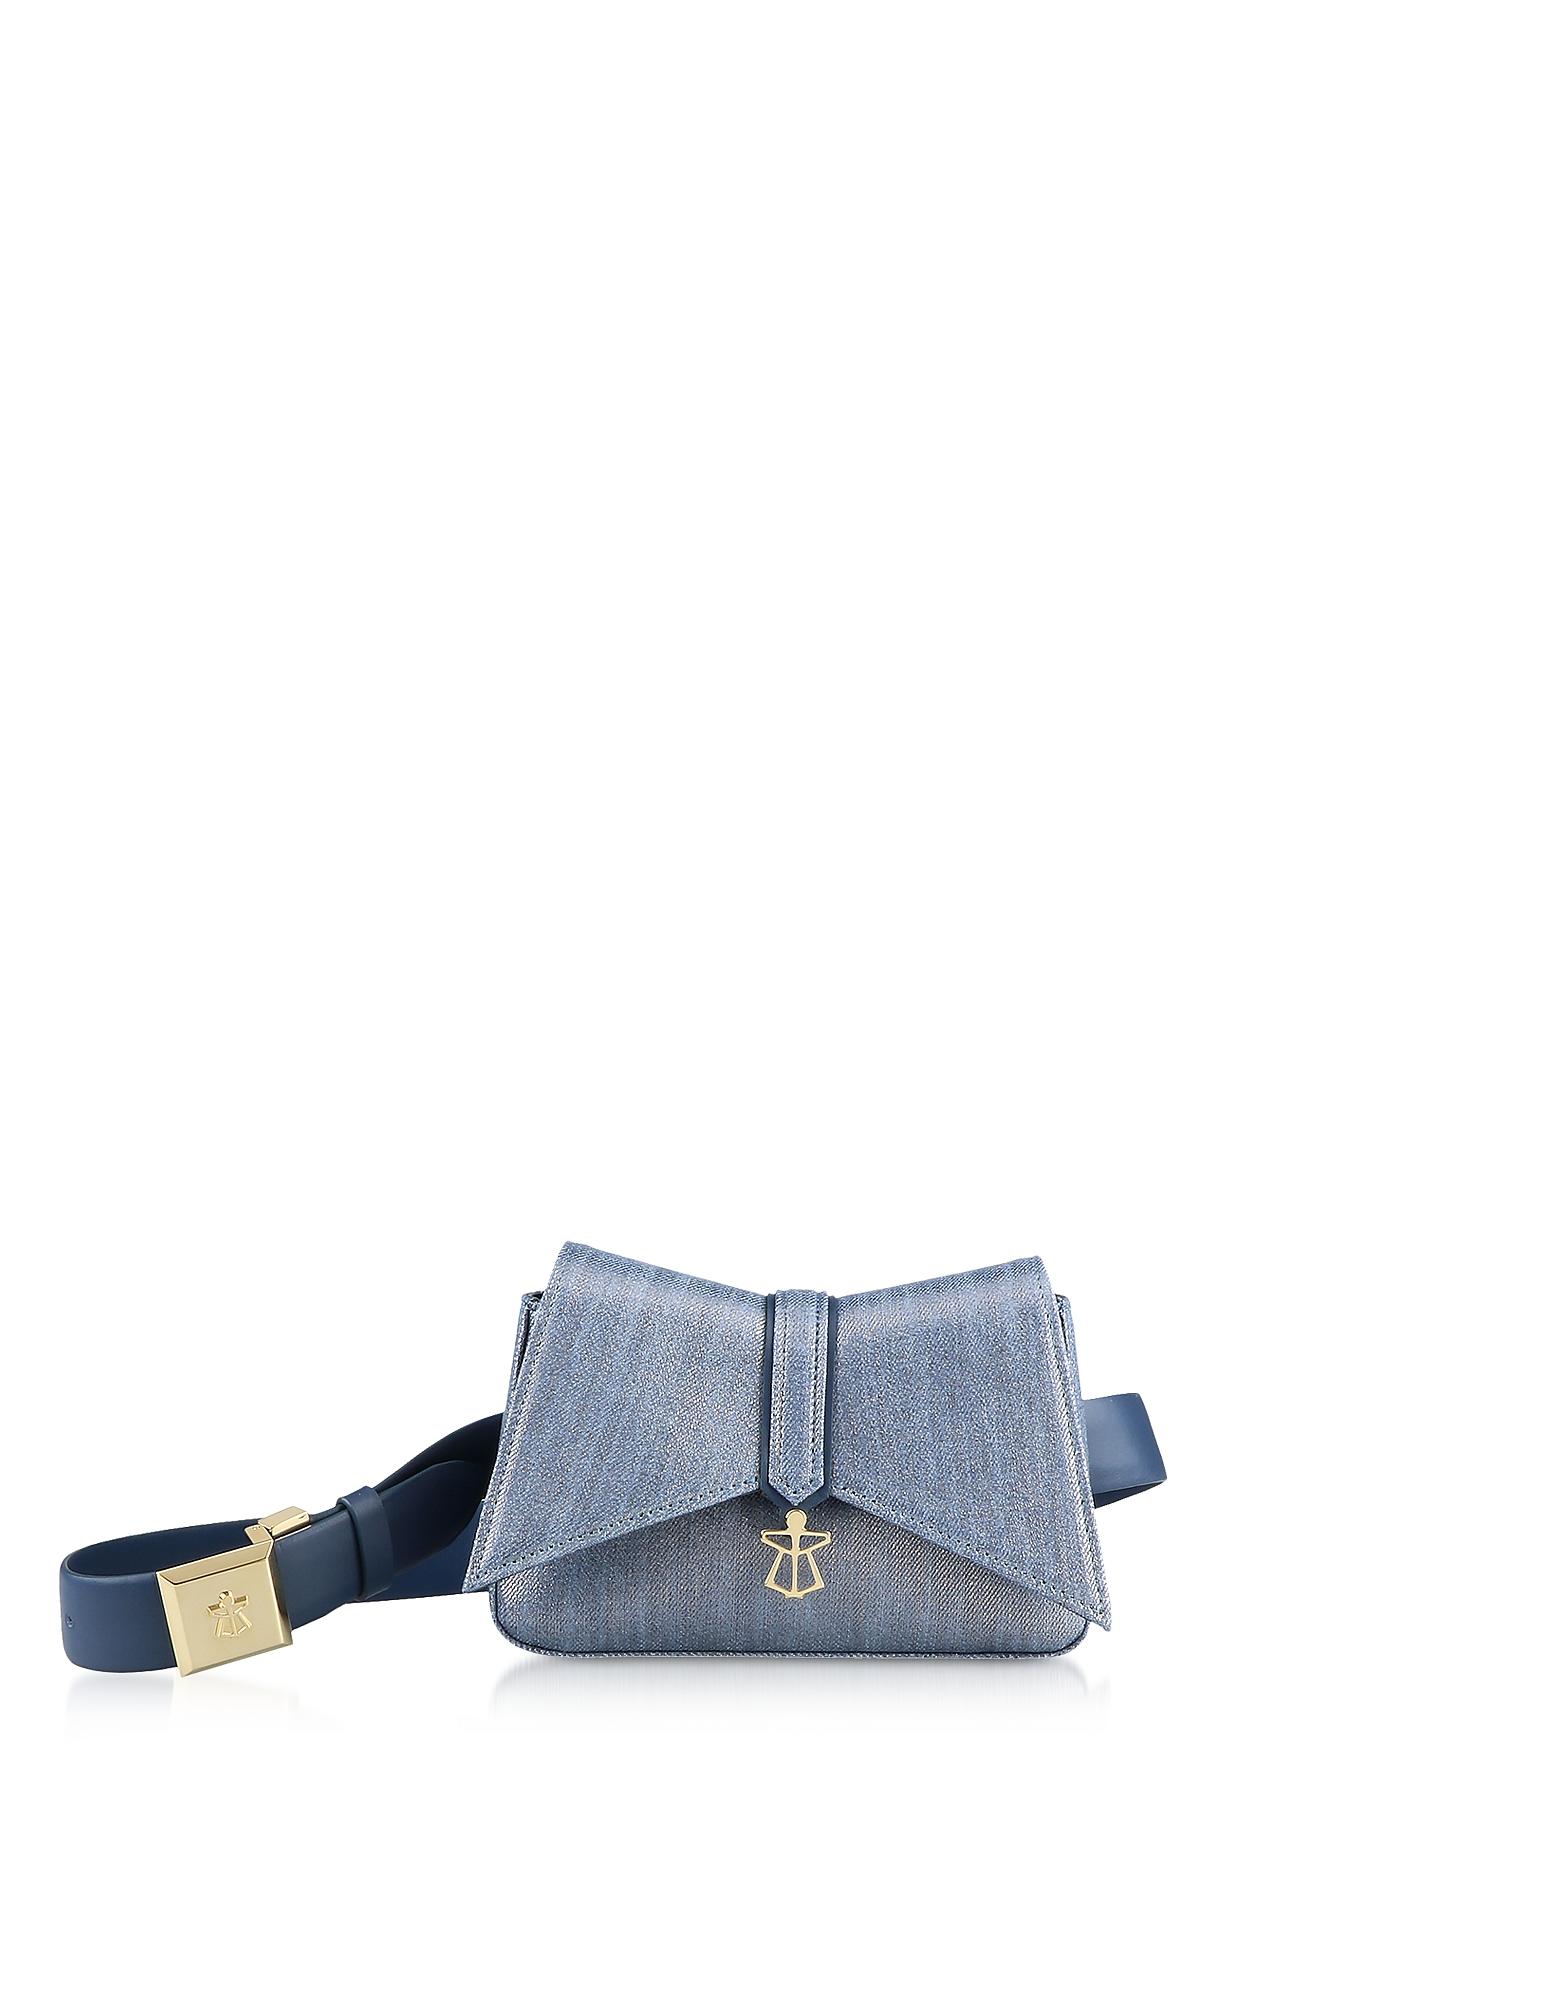 Lara Bellini Designer Handbags, Denim Blue Kiki Micro Belt Bag